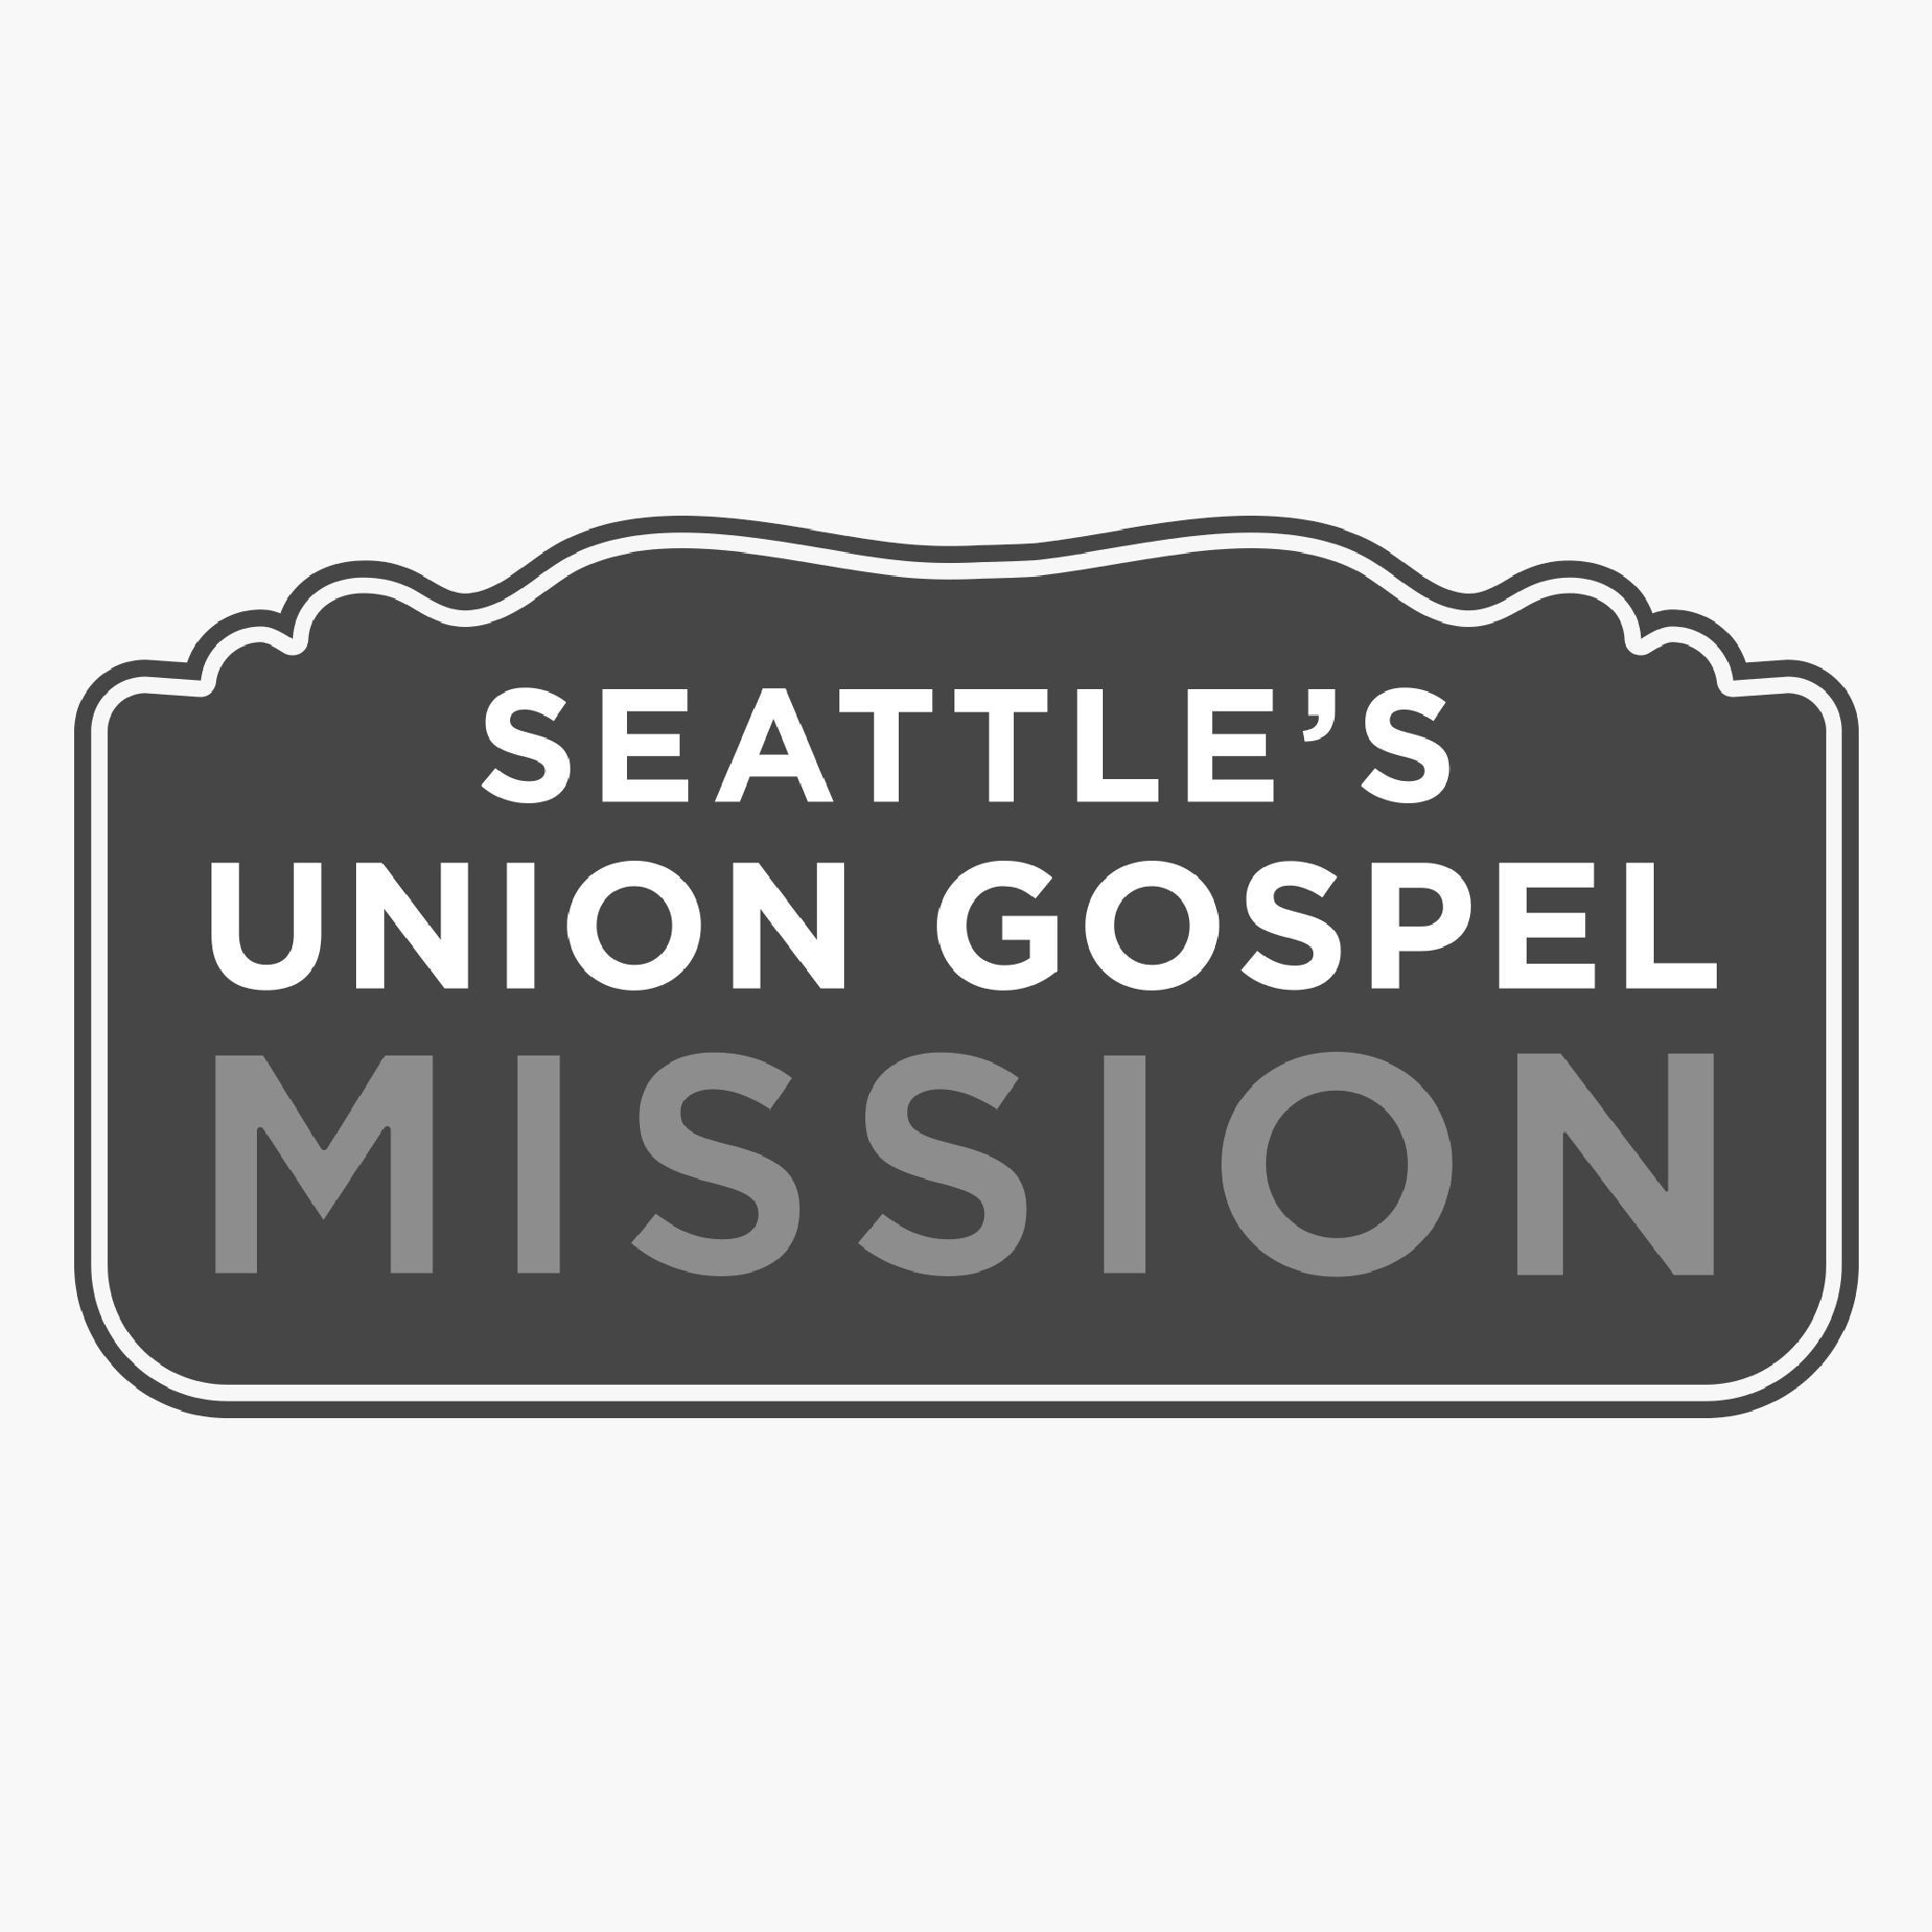 UnionGospelMission.jpg